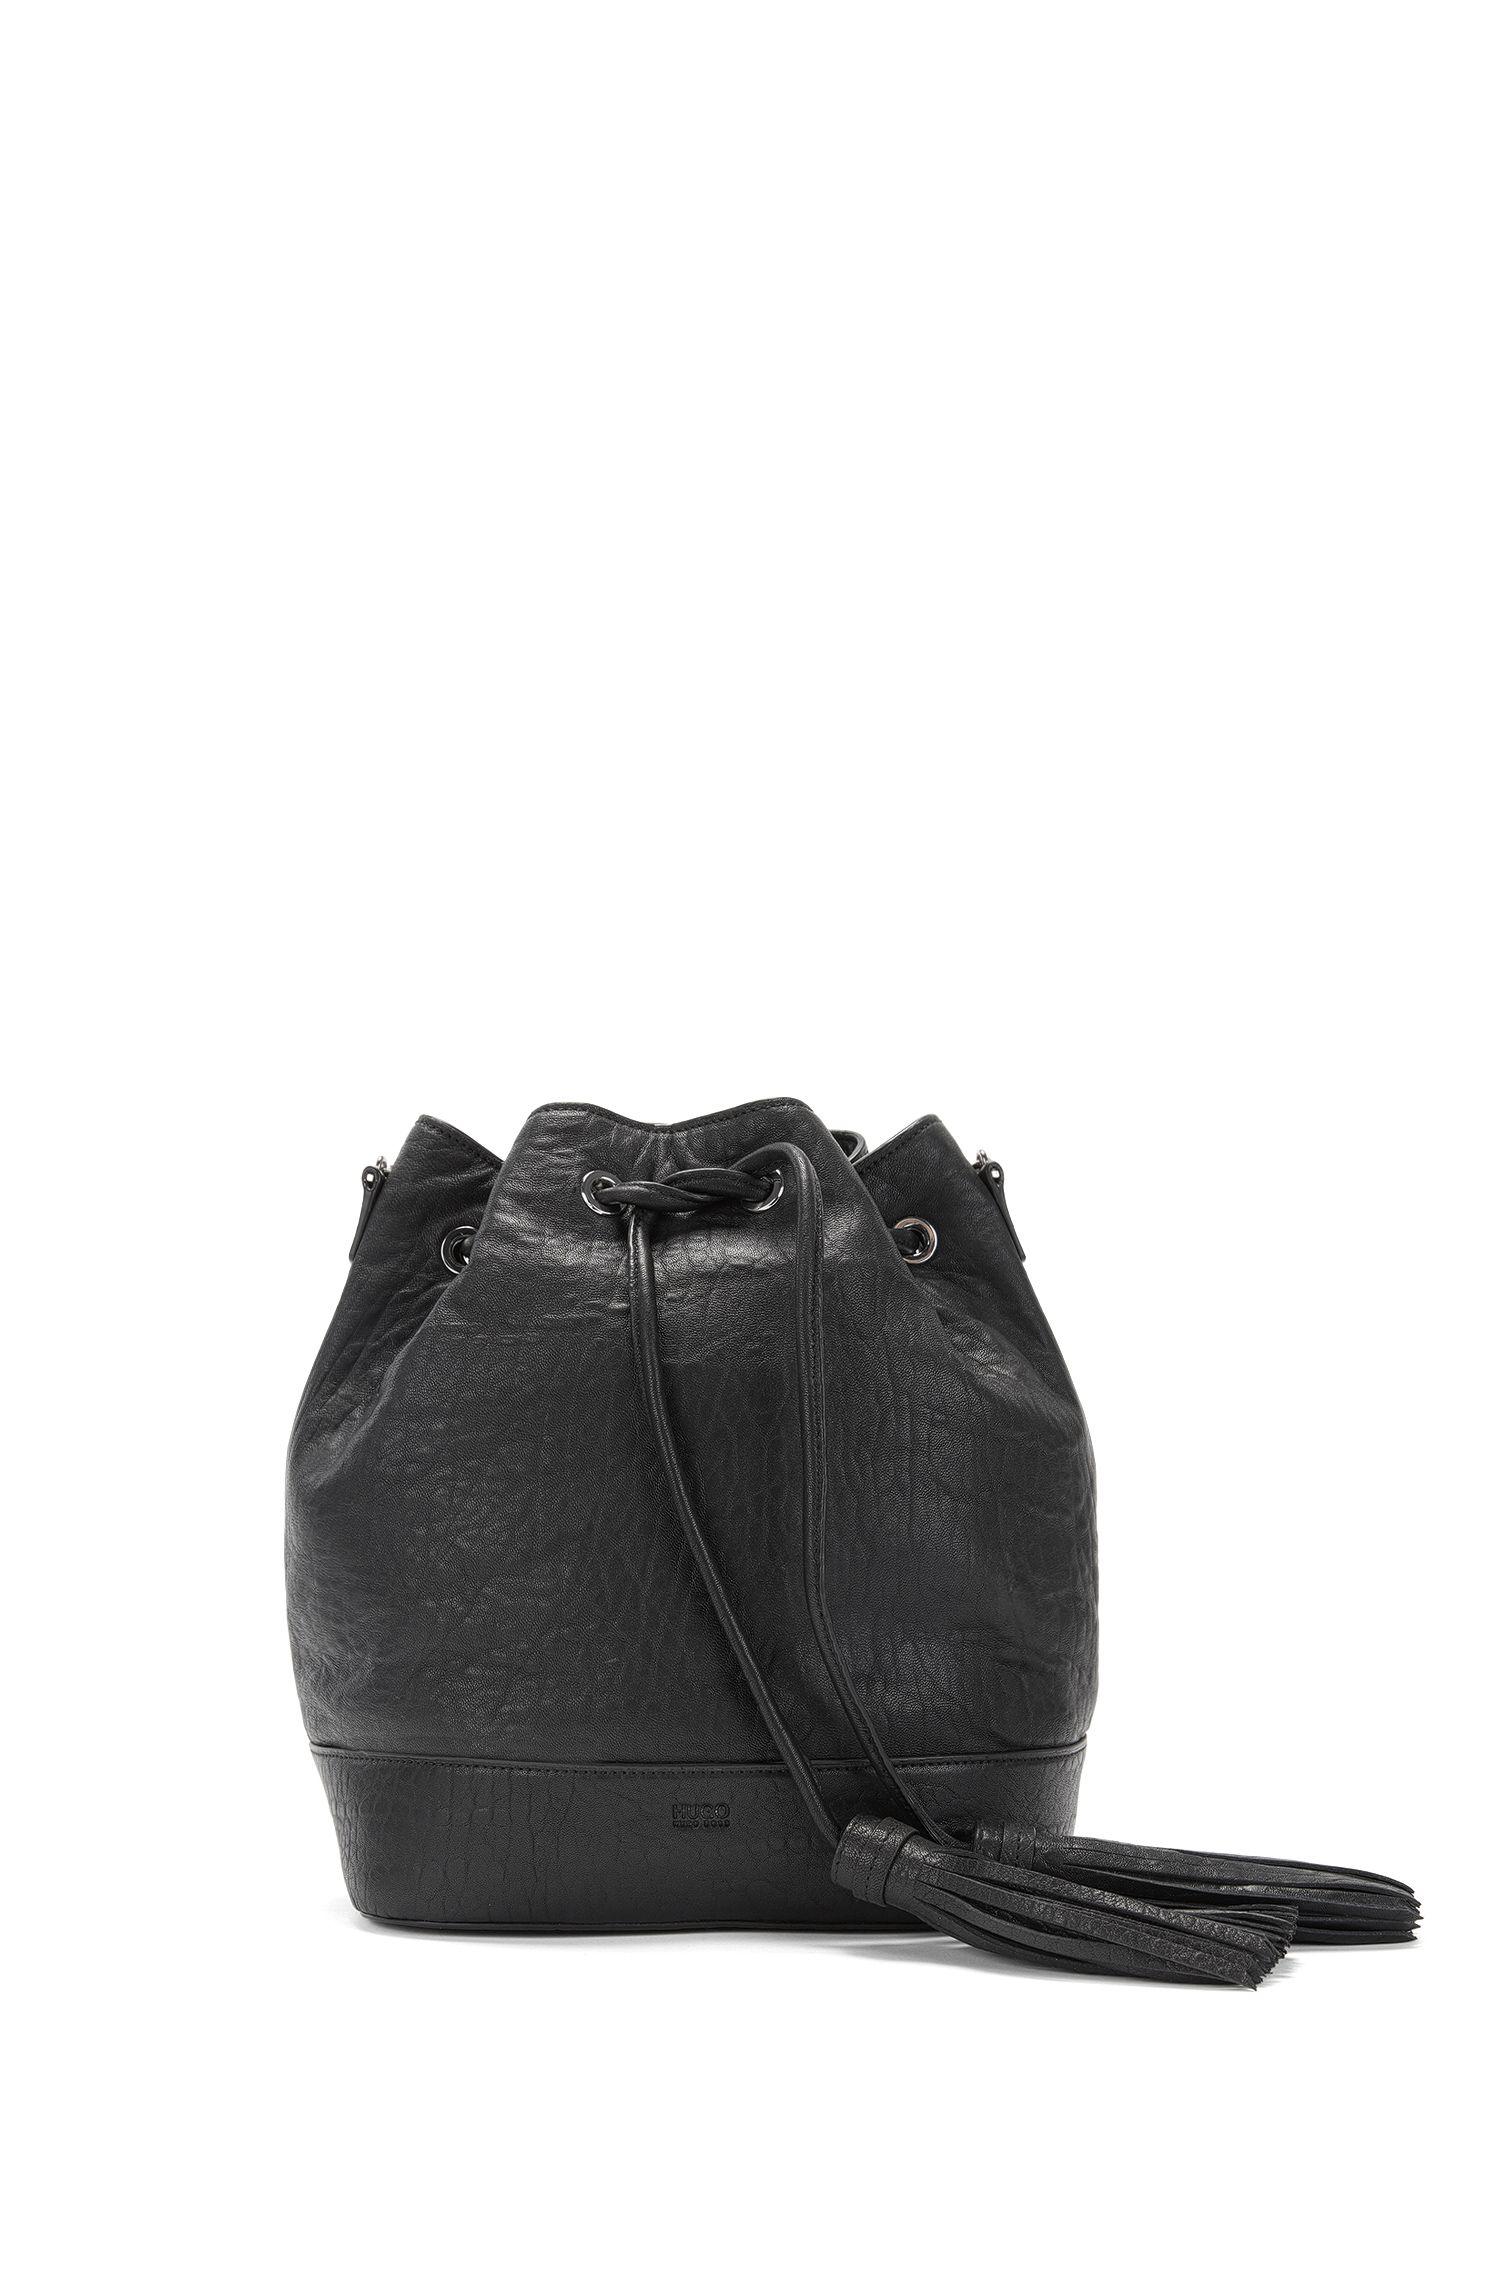 Drawstring bucket bag in Italian leather